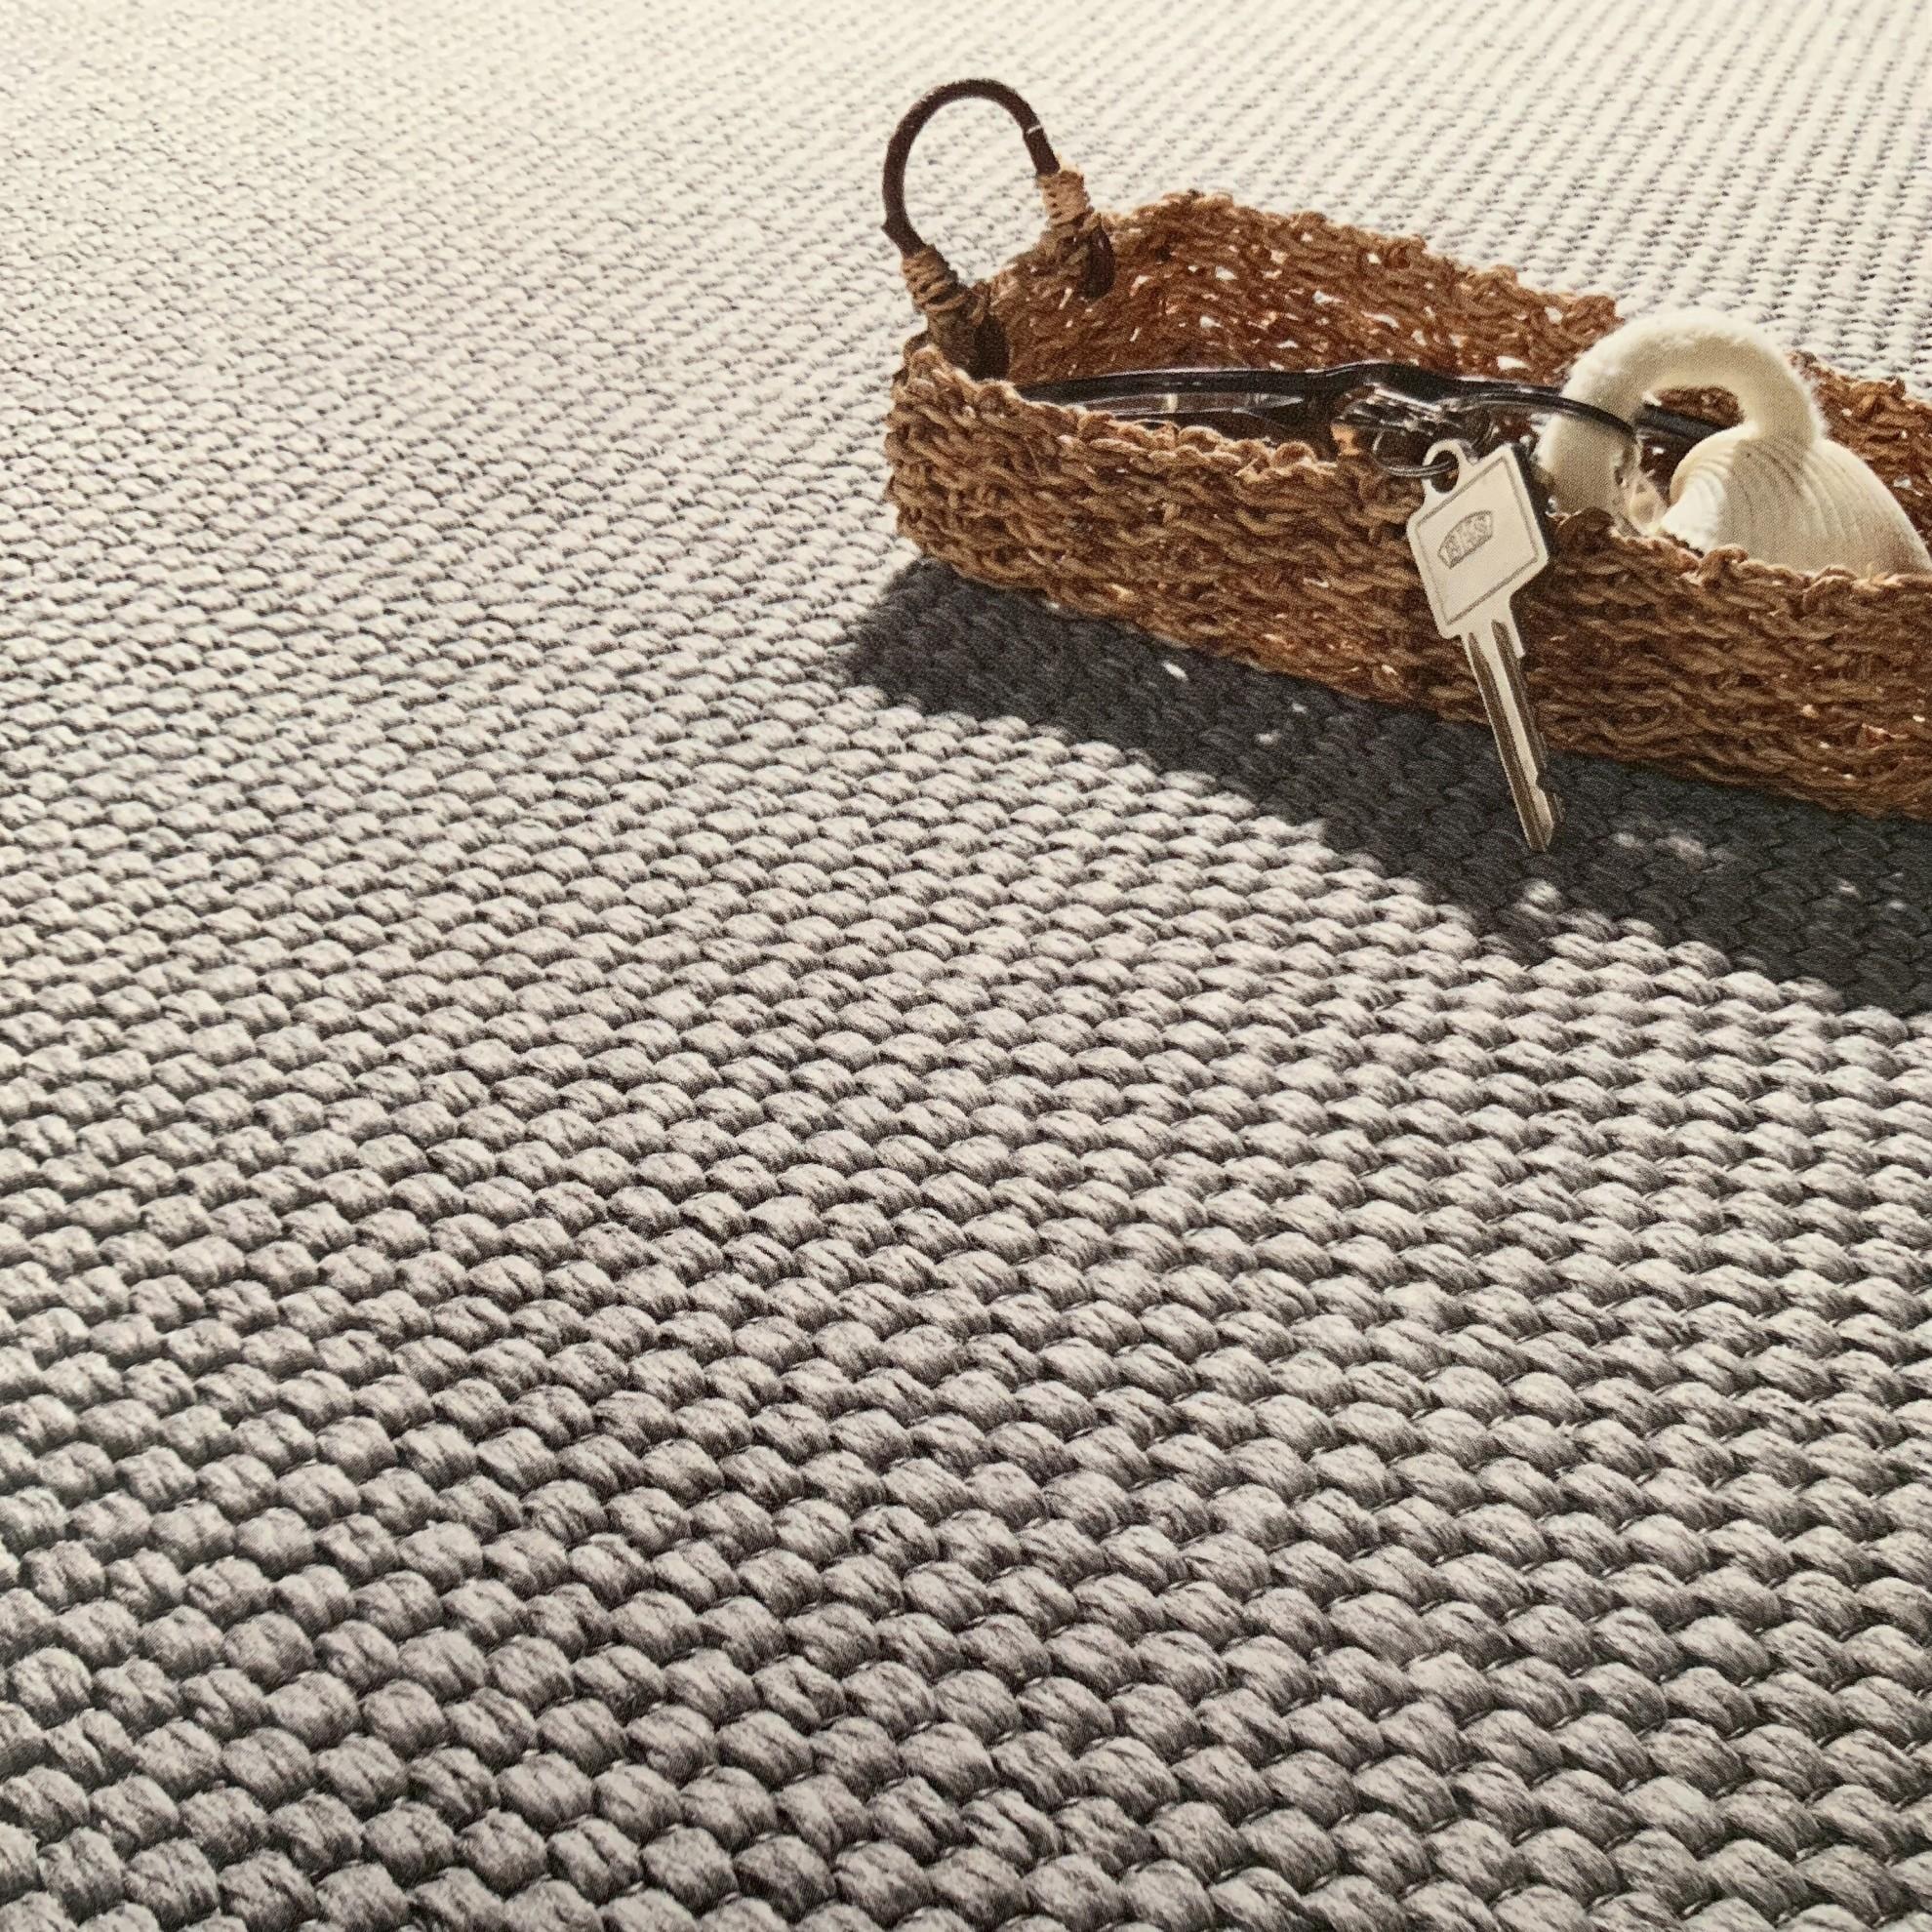 szurke-padloszonyeg-kicsi